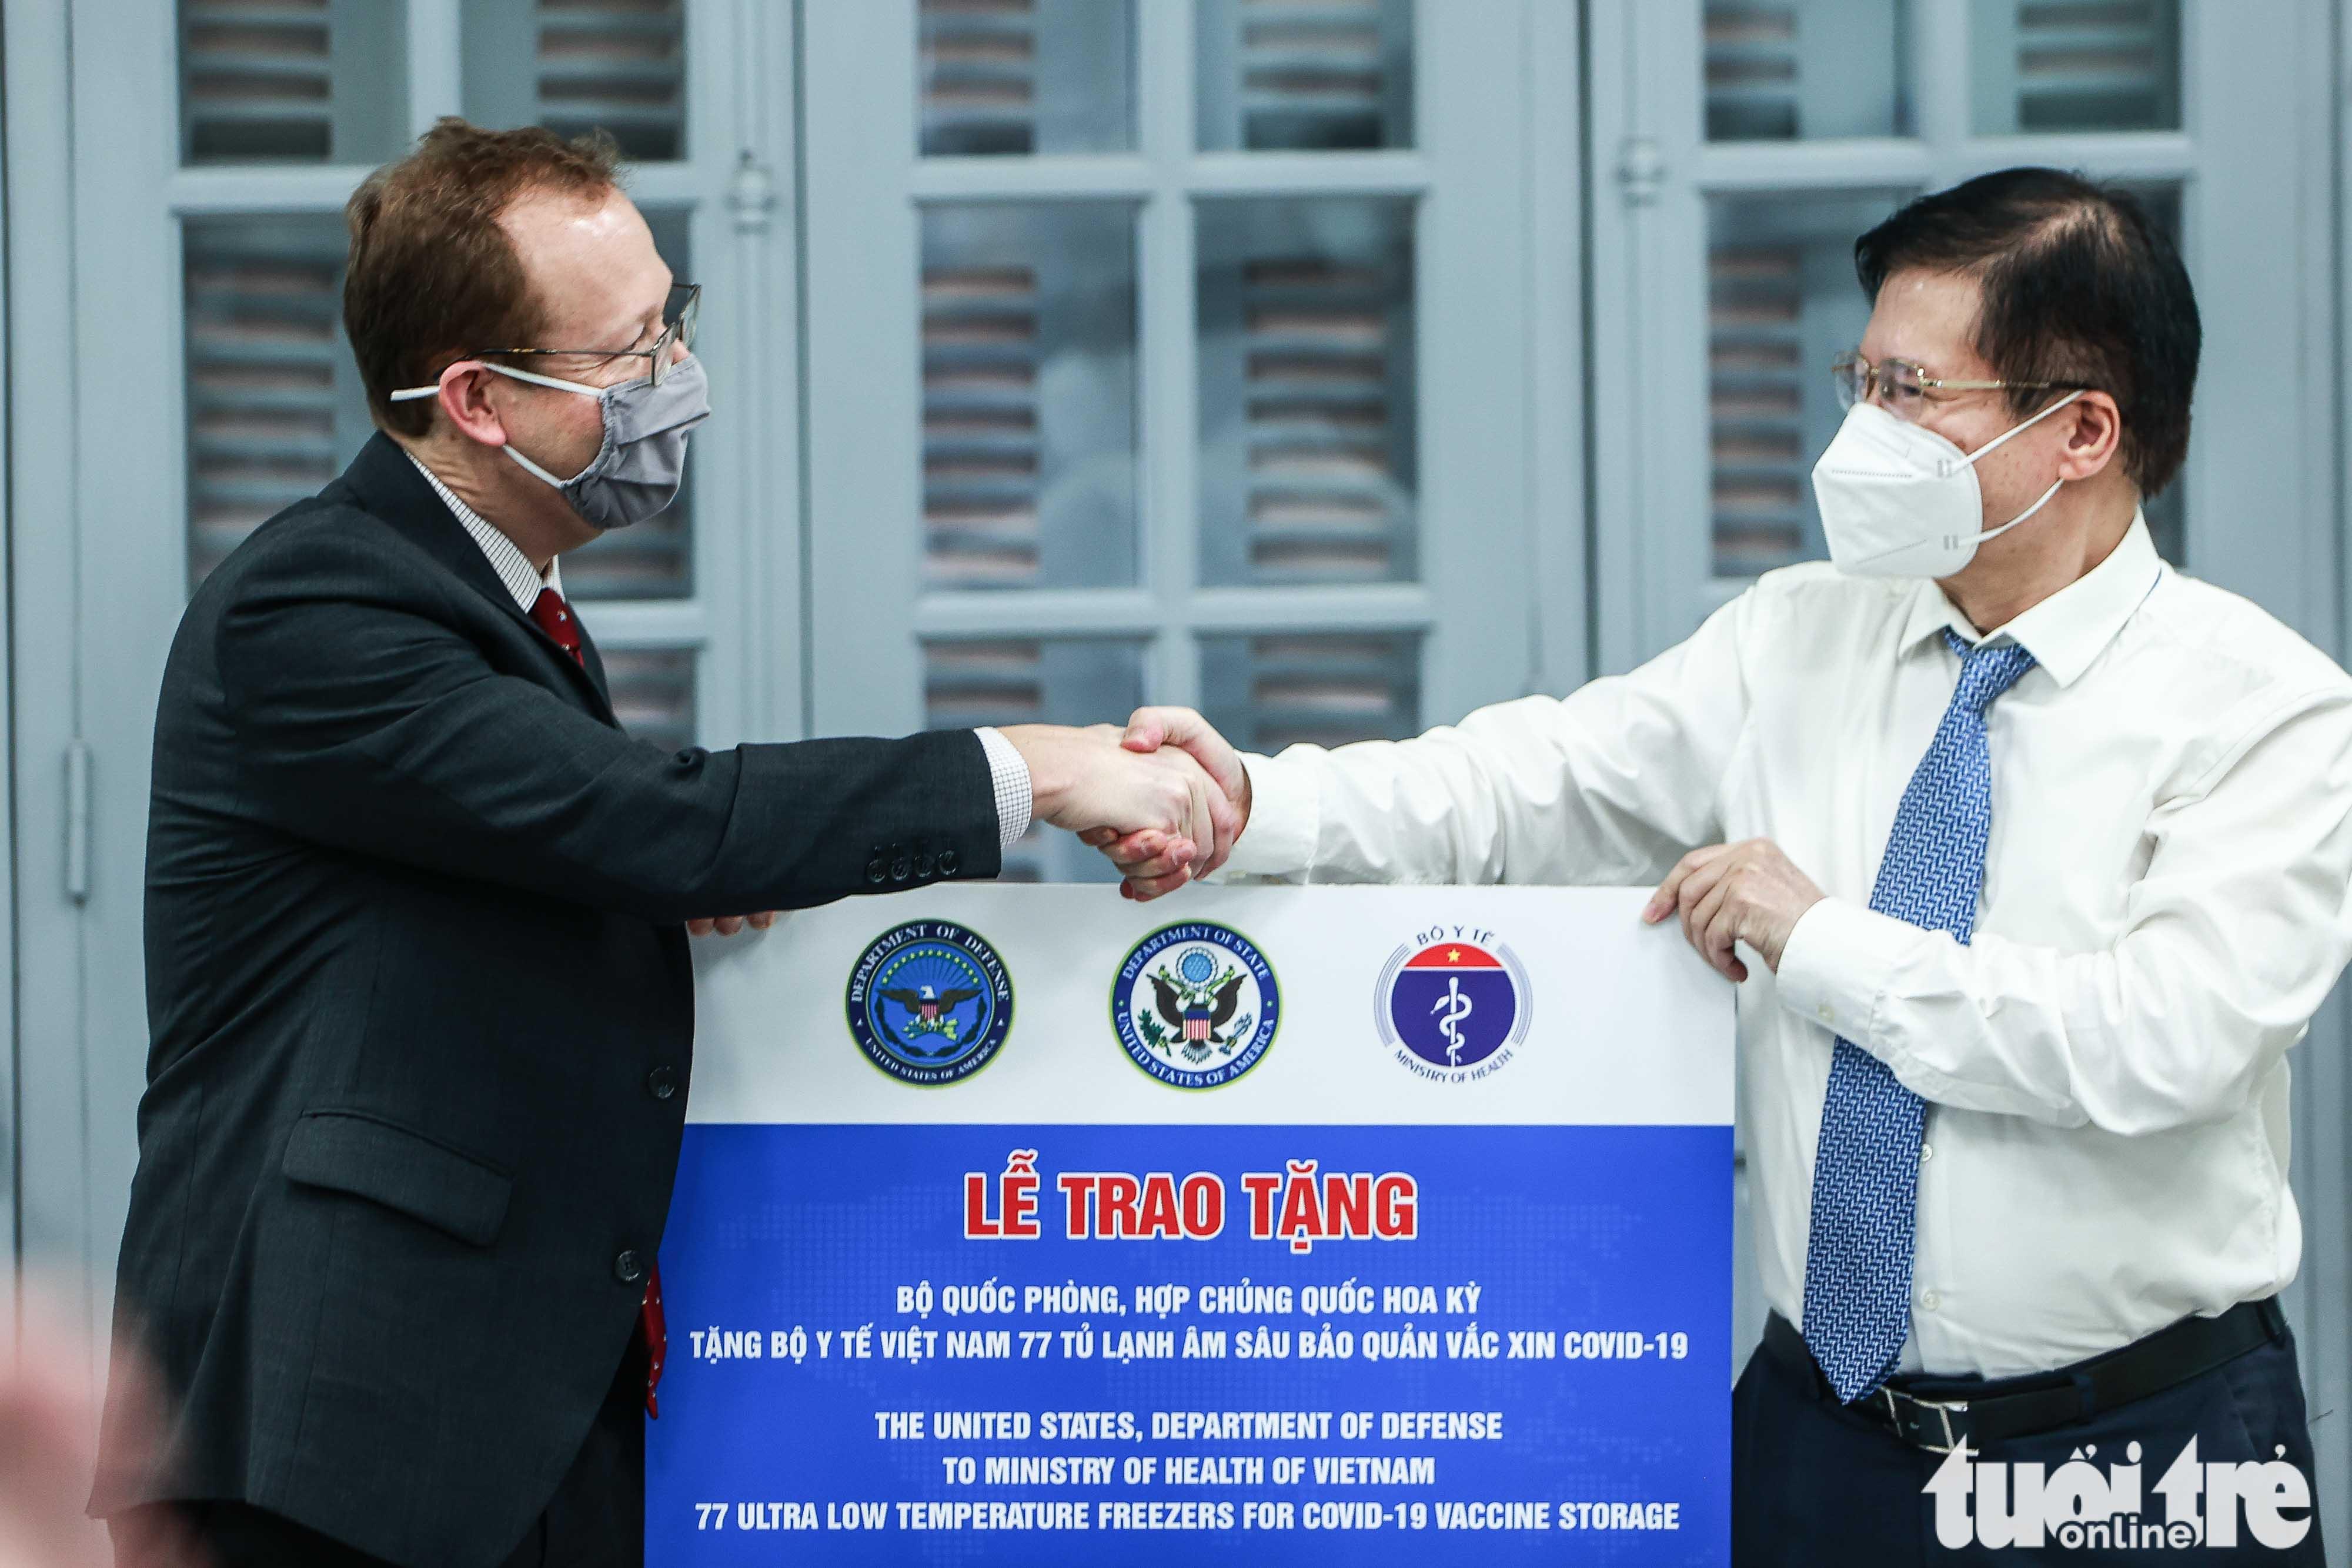 US hands over 36 freezers to assist Vietnam in storing COVID-19 vaccines